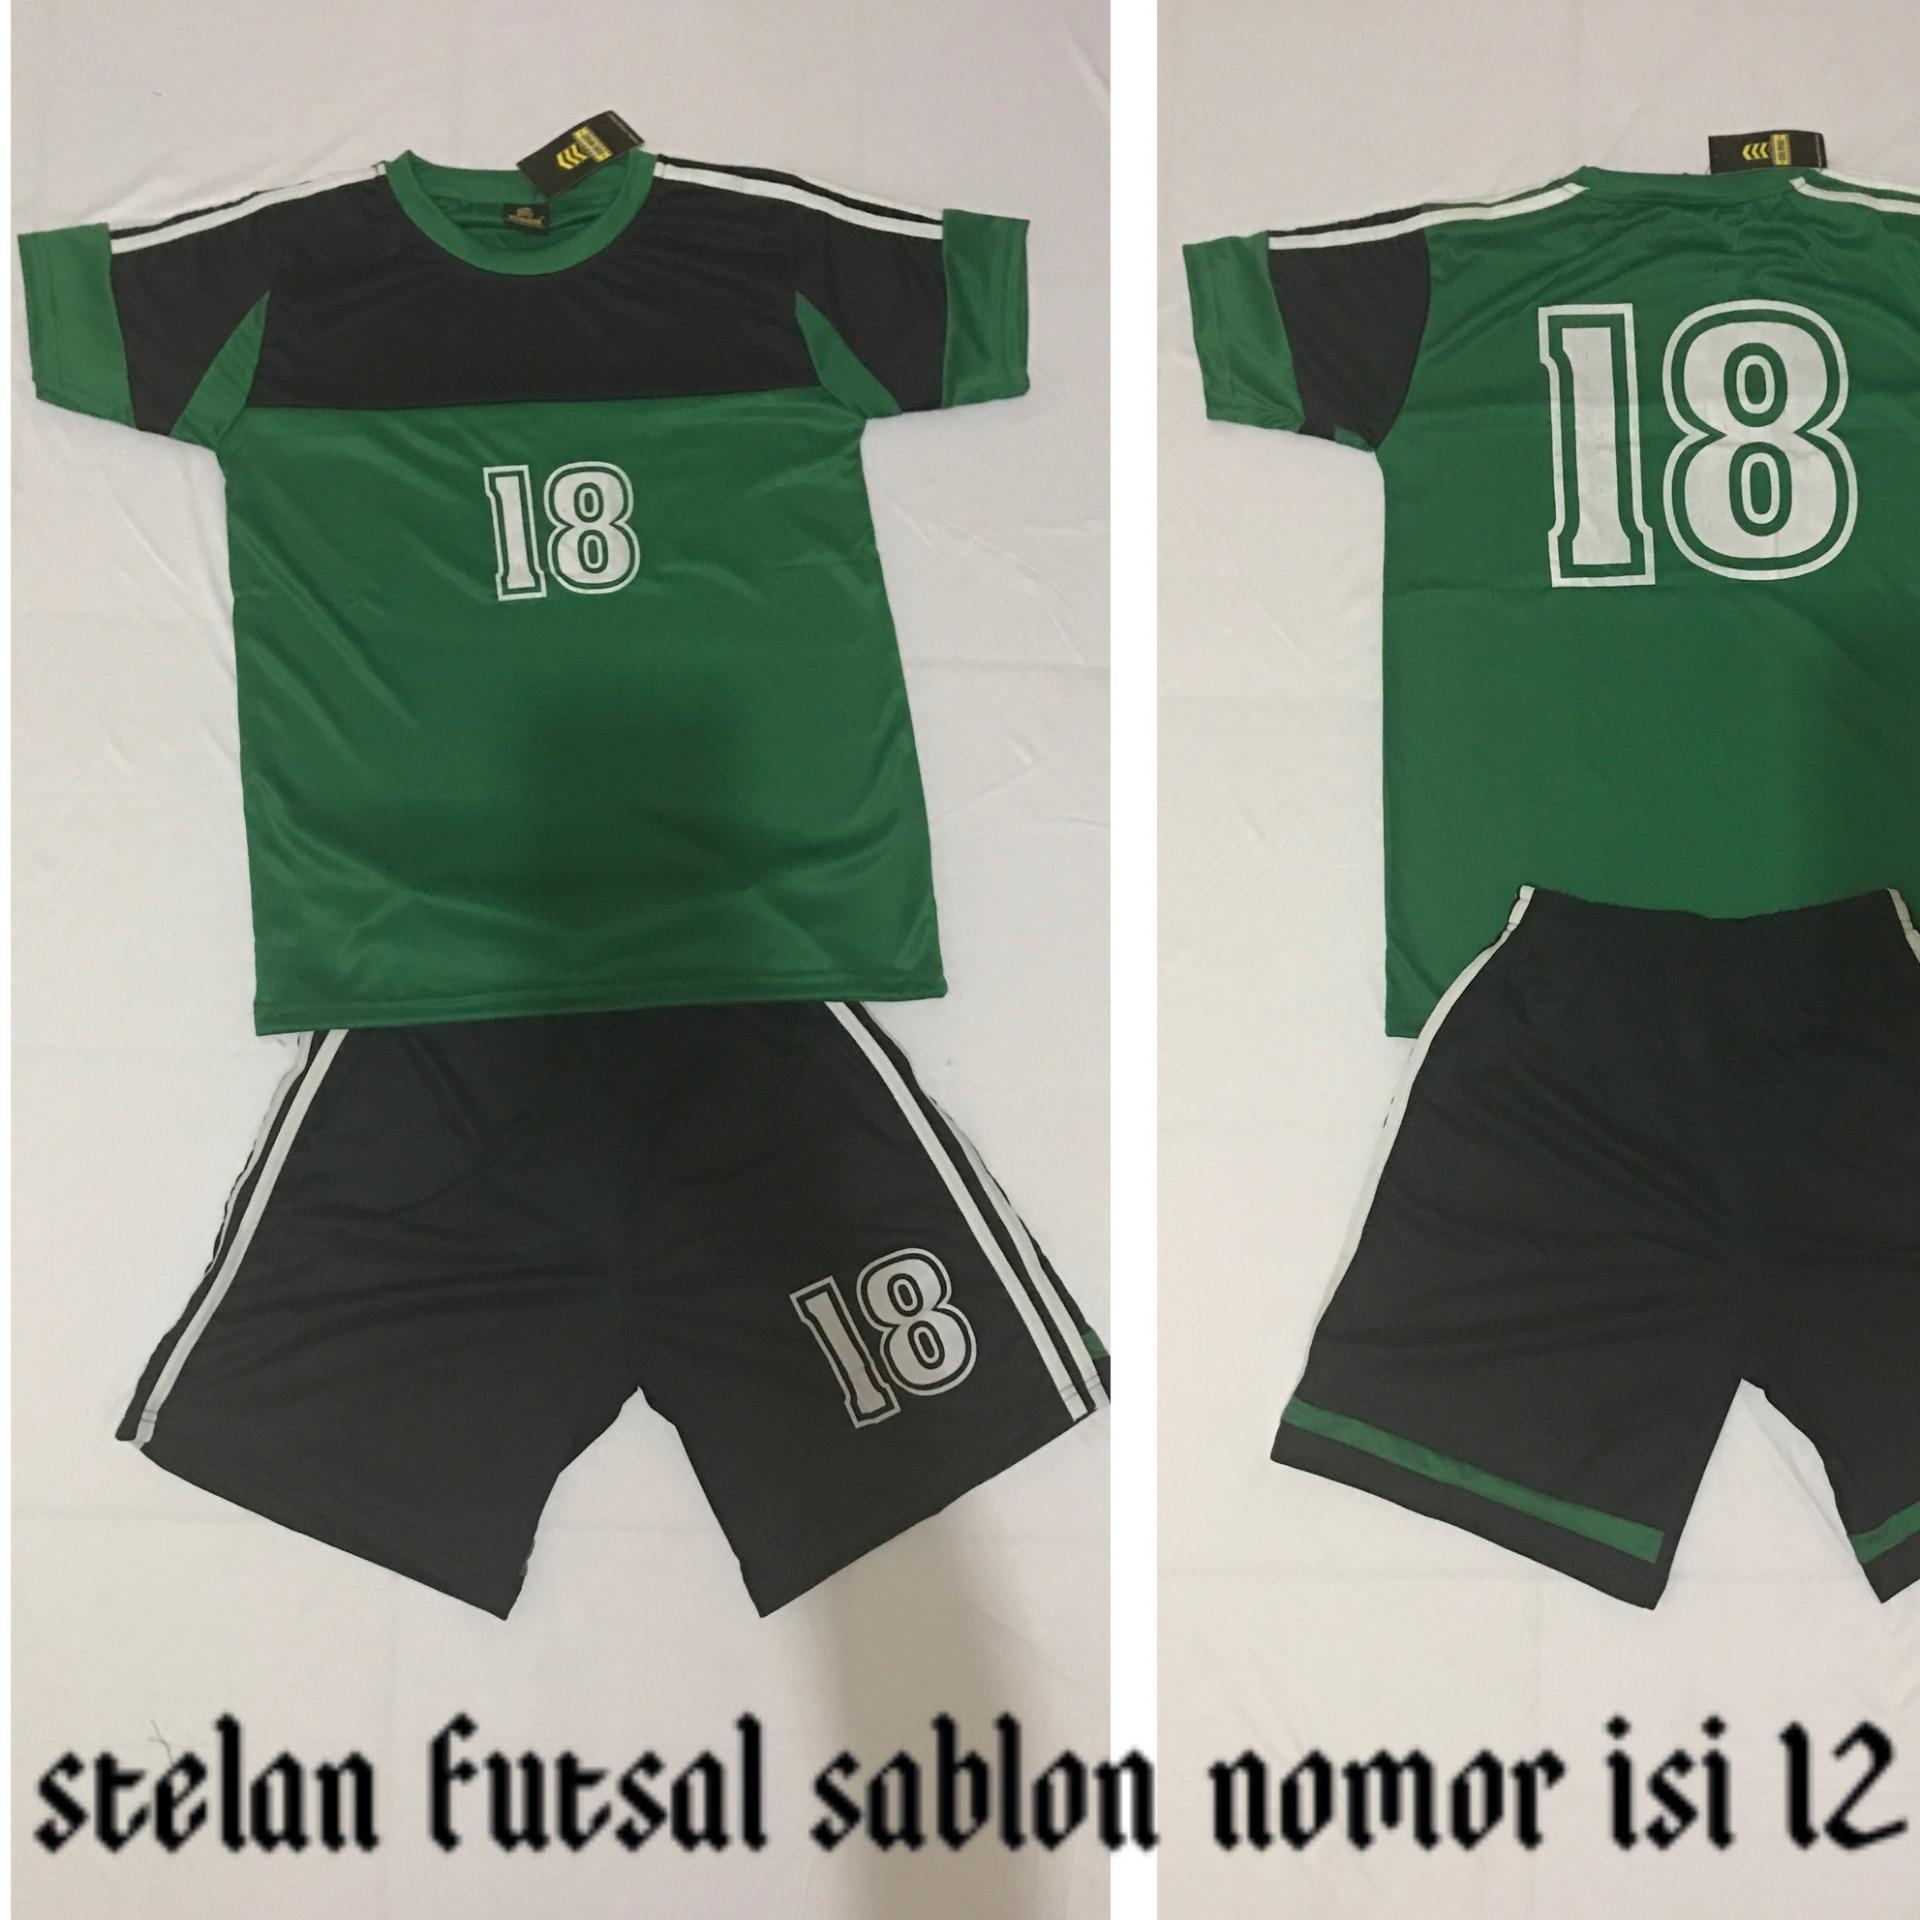 Setelan Futsal Sepakbola Soccer Under Armour Ua01 Baju Kaos Celana Nike Nk27 Jersey Bola Zone Sport Volispn15g